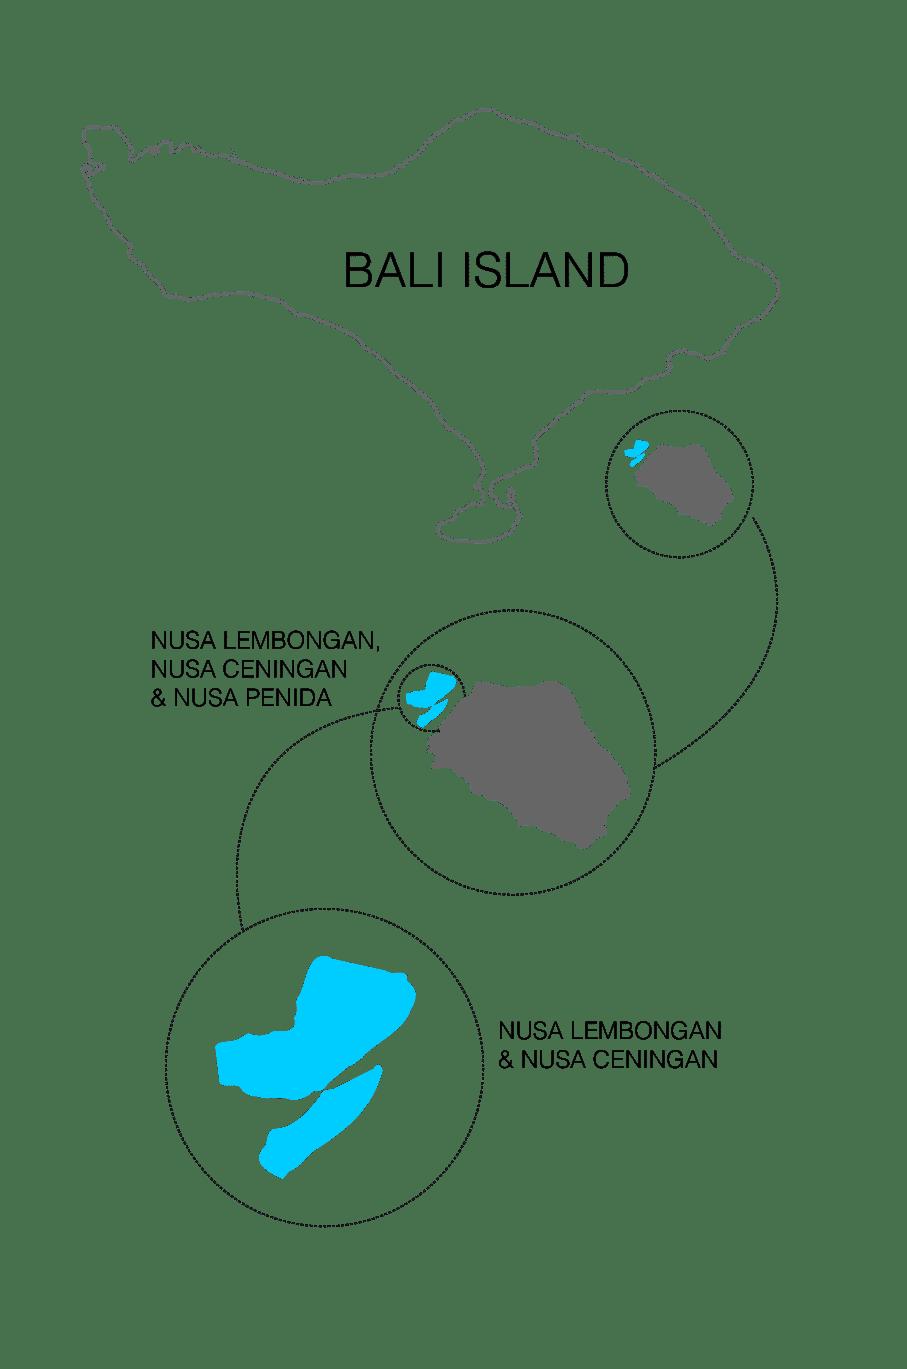 bali-island